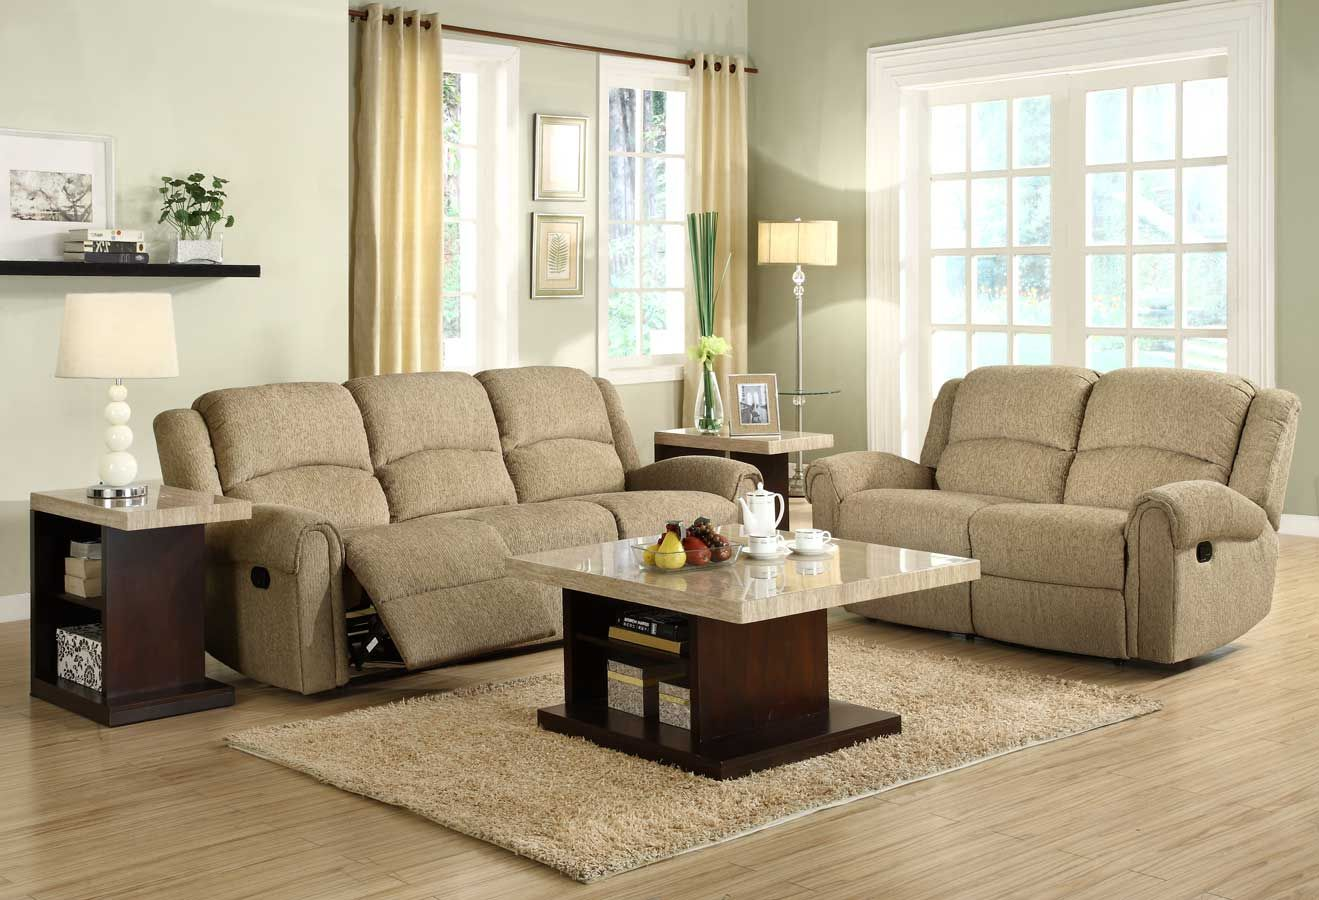 Best Homelegance Esther Reclining Sofa Set Beige Chenille 400 x 300